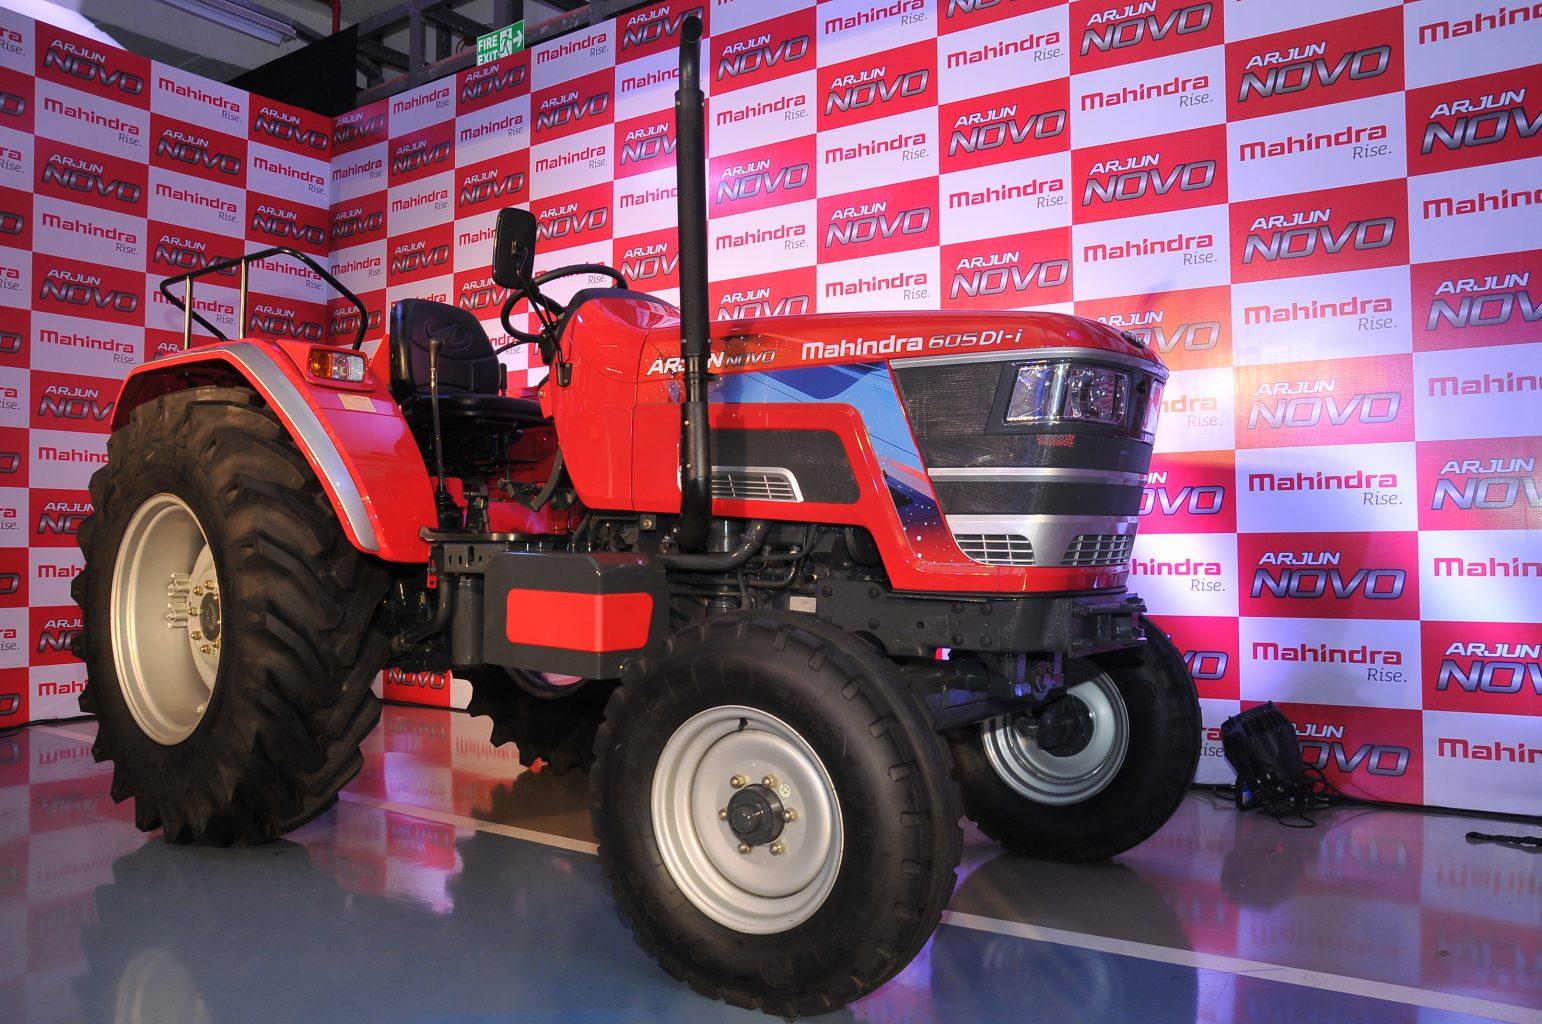 Mahindra-605-DI-I-review